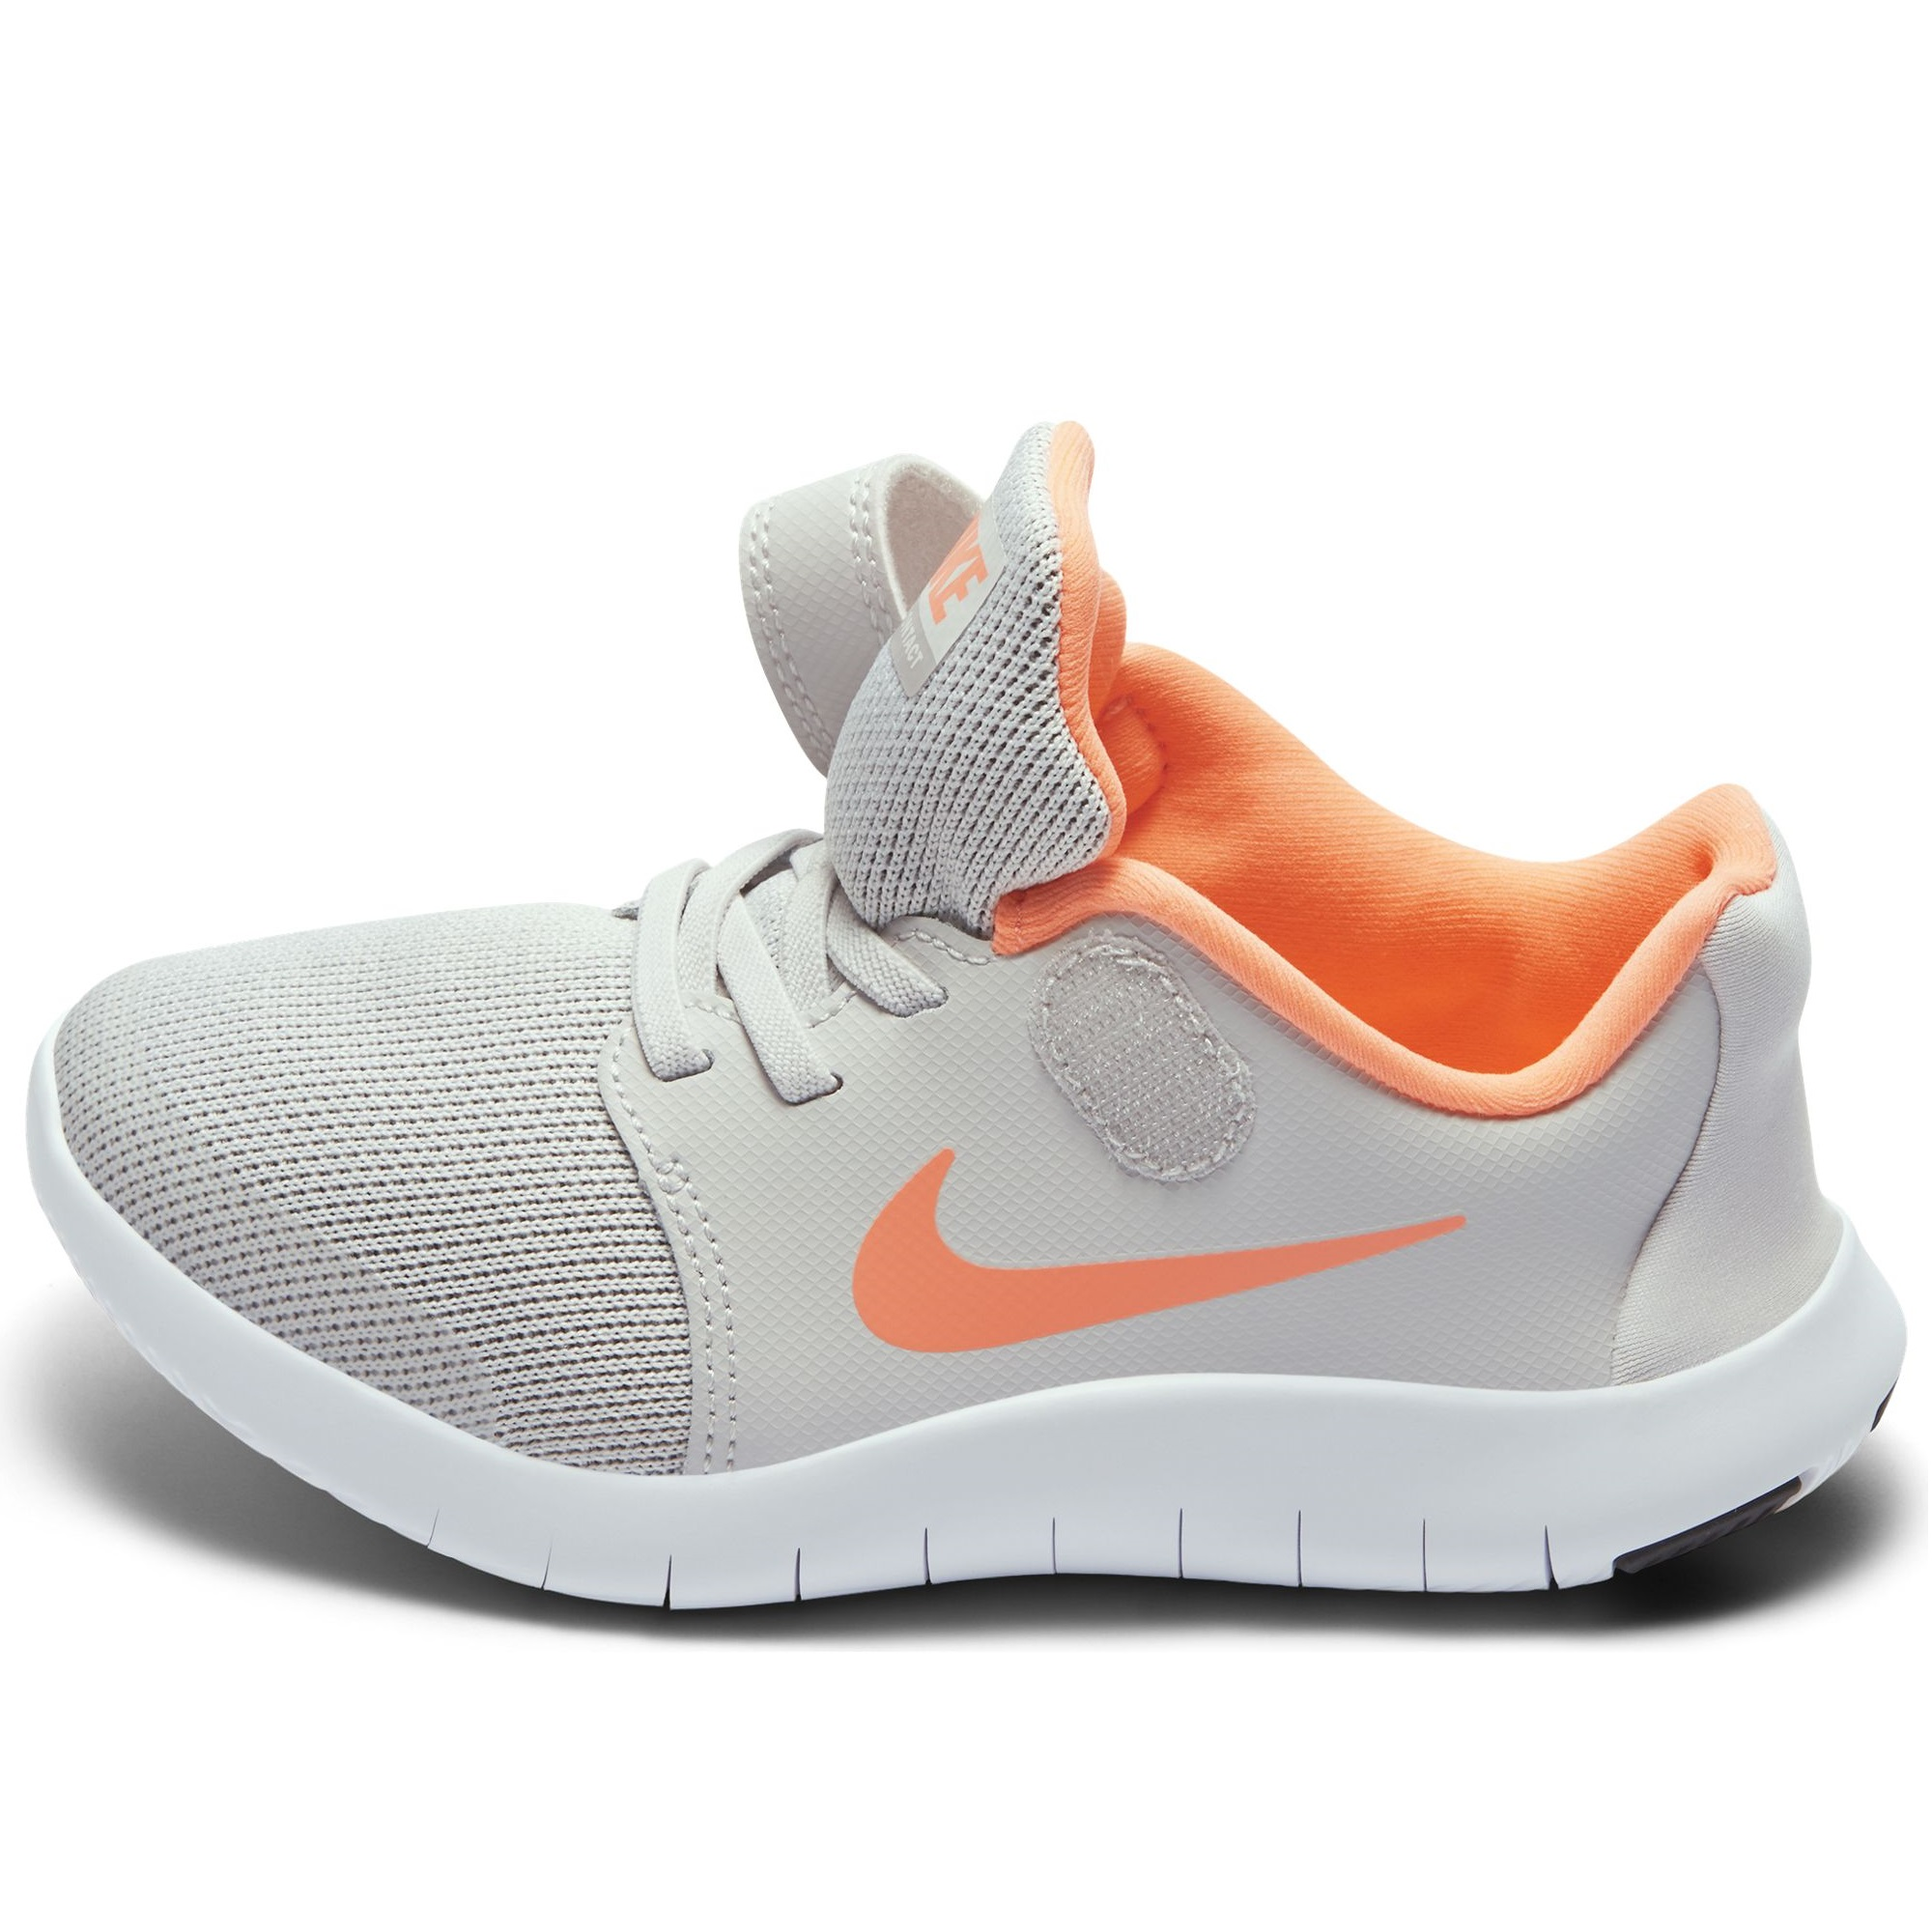 829ff205 Детские кроссовки Nike Flex Contact 2 Vast Grey/Crimson Pulse-Atmosphere  Grey - фото